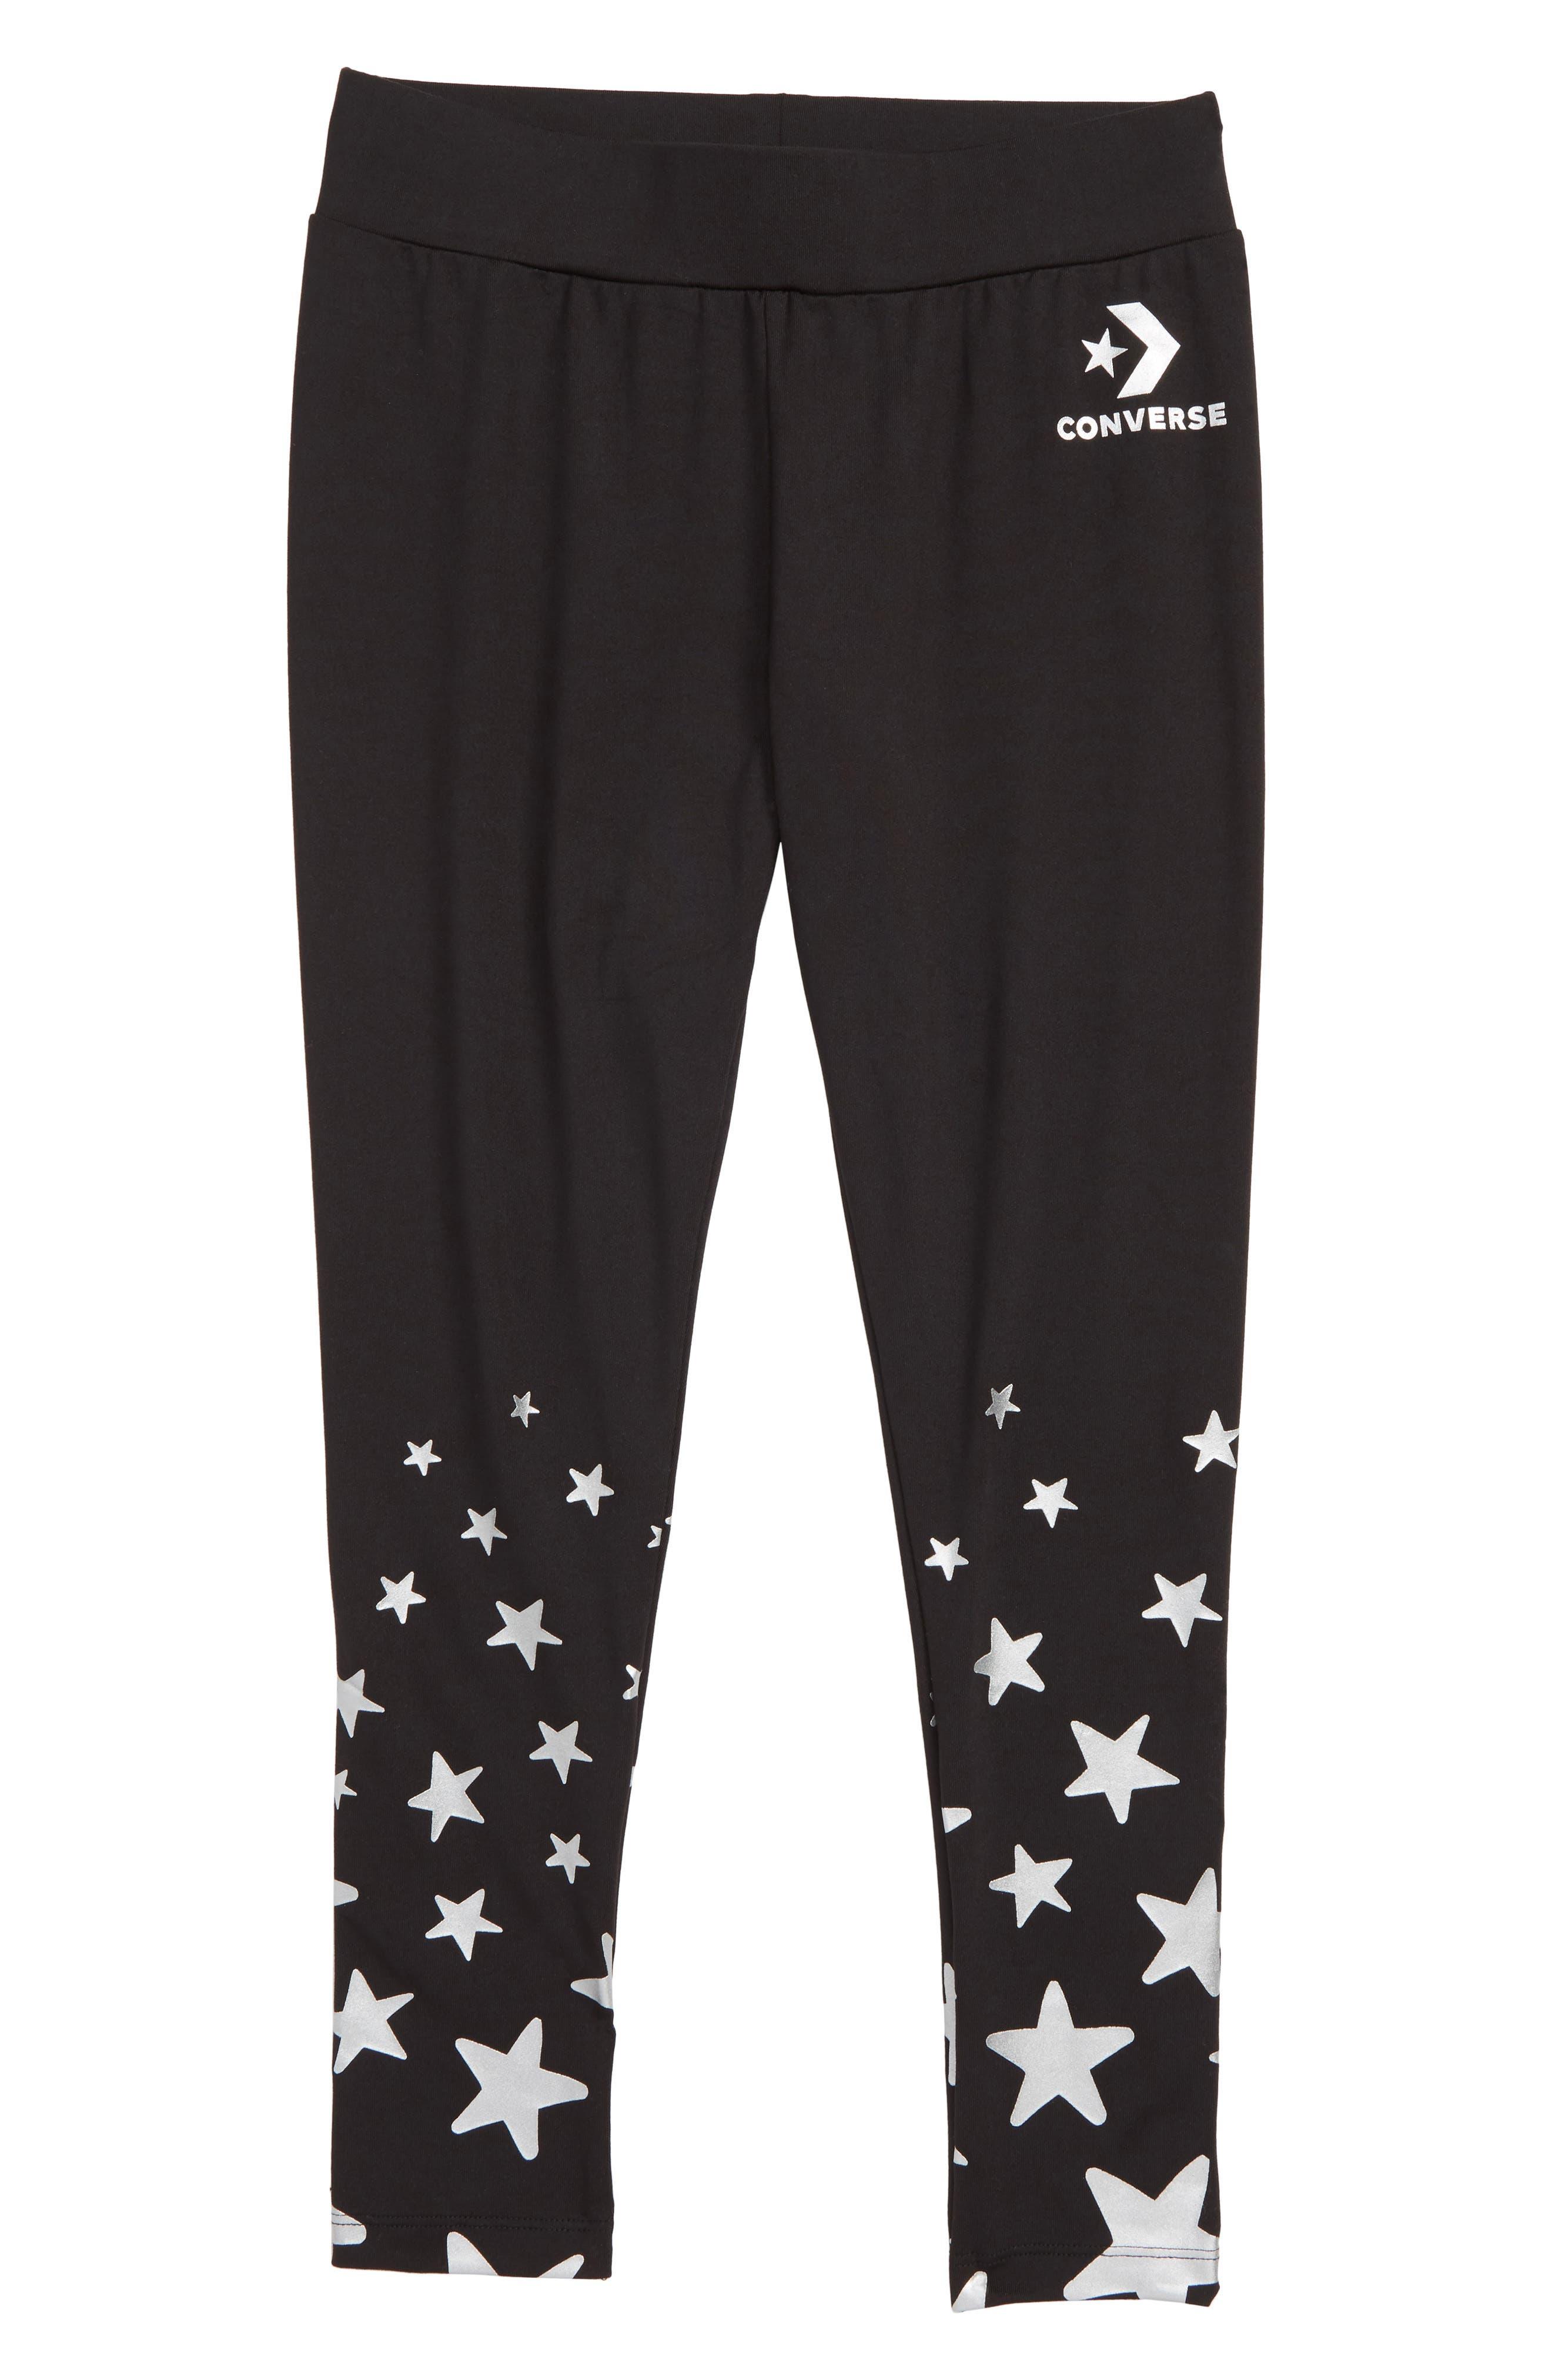 Star Leggings,                             Main thumbnail 1, color,                             BLACK